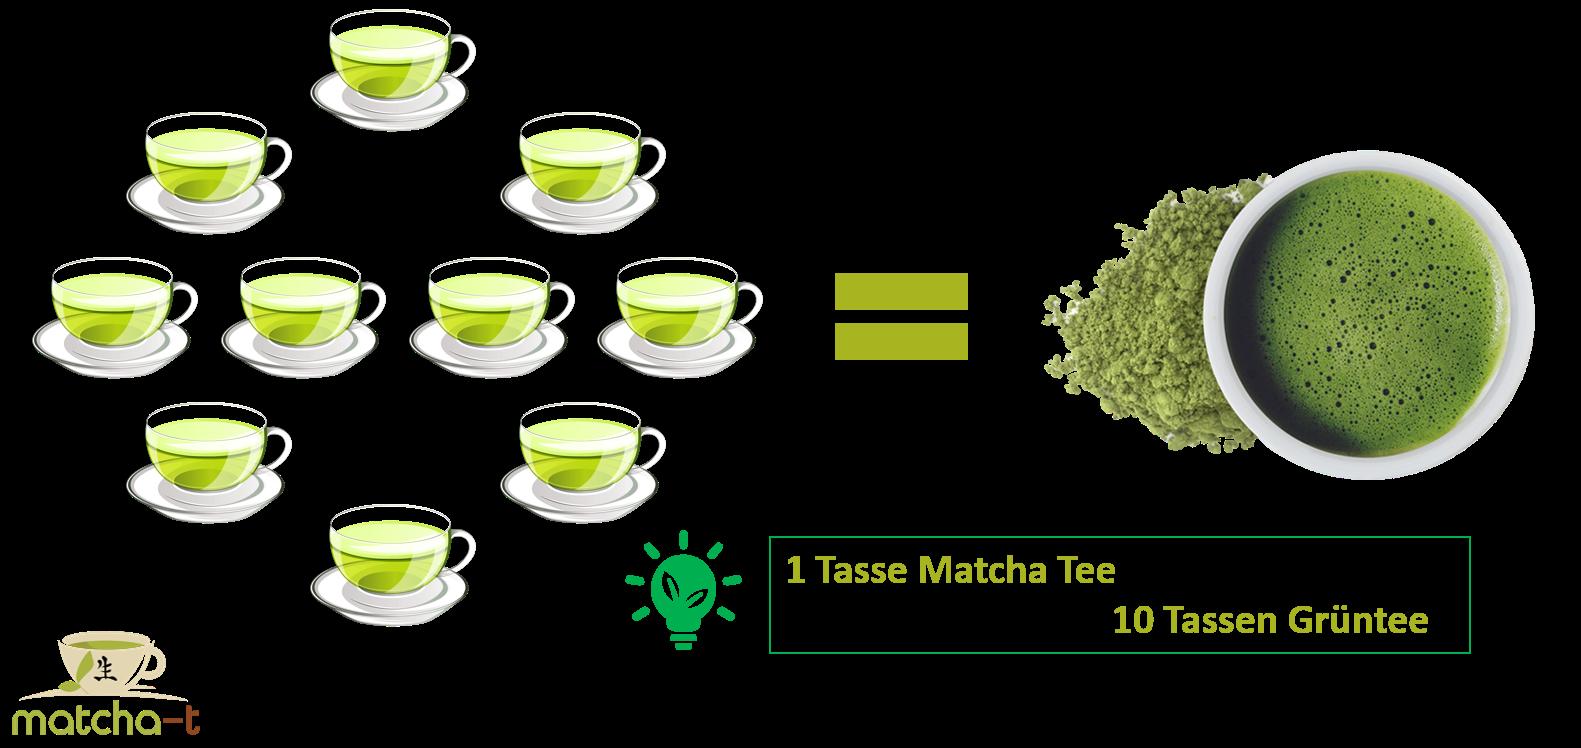 Matcha Tee vs. Grüntee